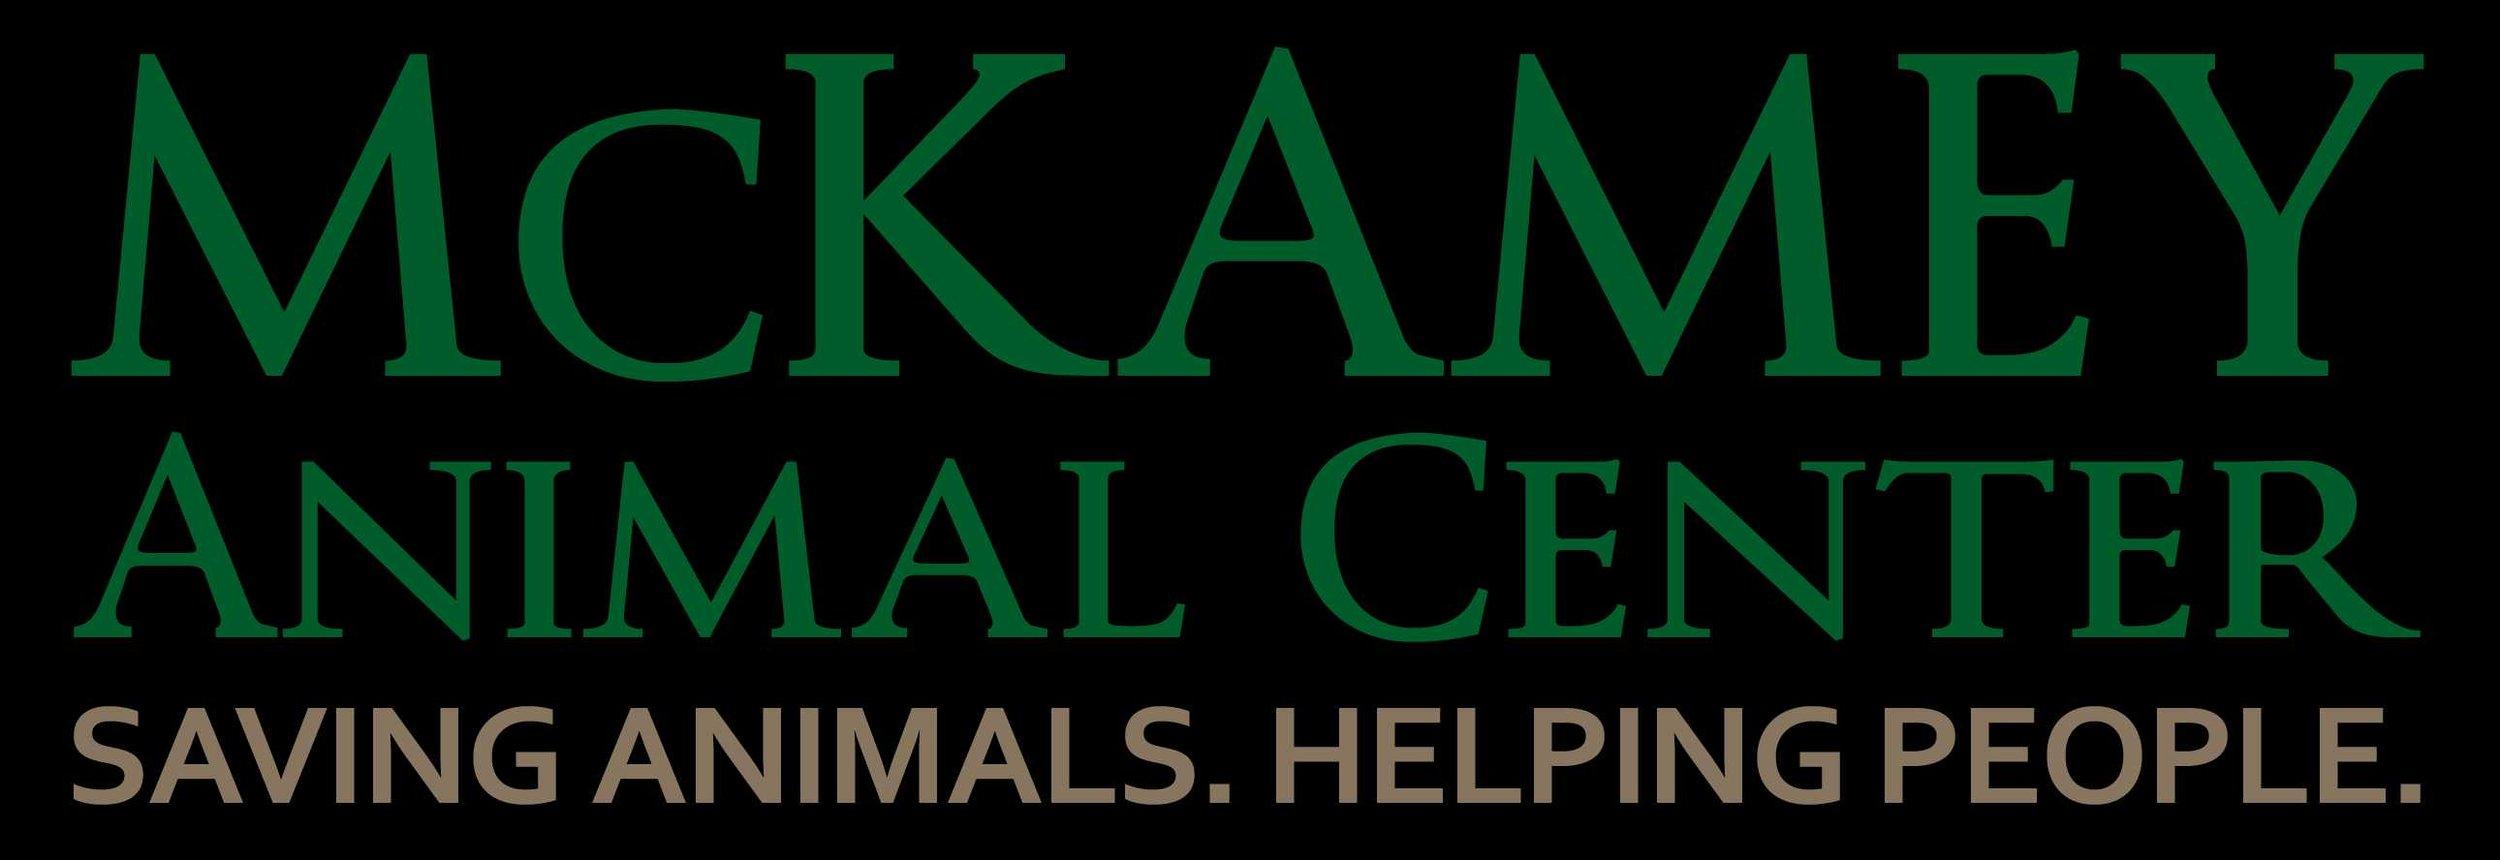 McKamey Animal Center. Savings Animals. Helping People.